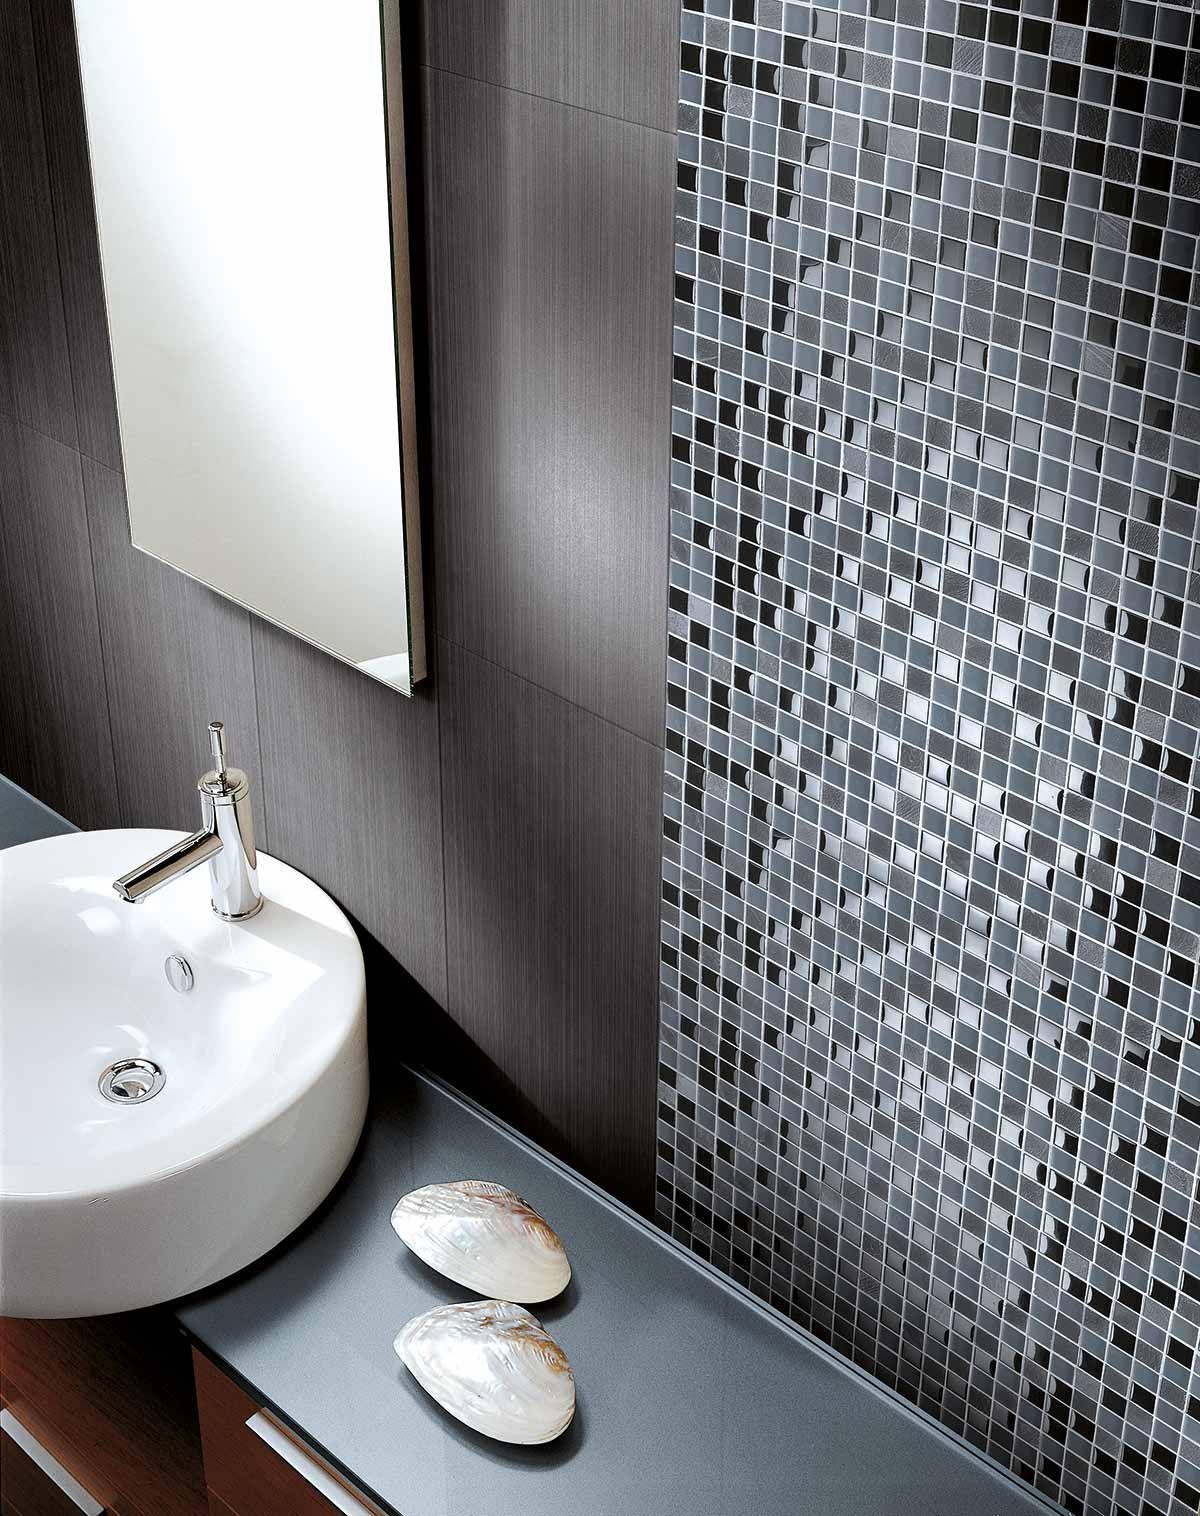 Schwarze Mosaikfliesen Badezimmer Mosaik Mosaik Fliesen Bad Mosaikfliesen